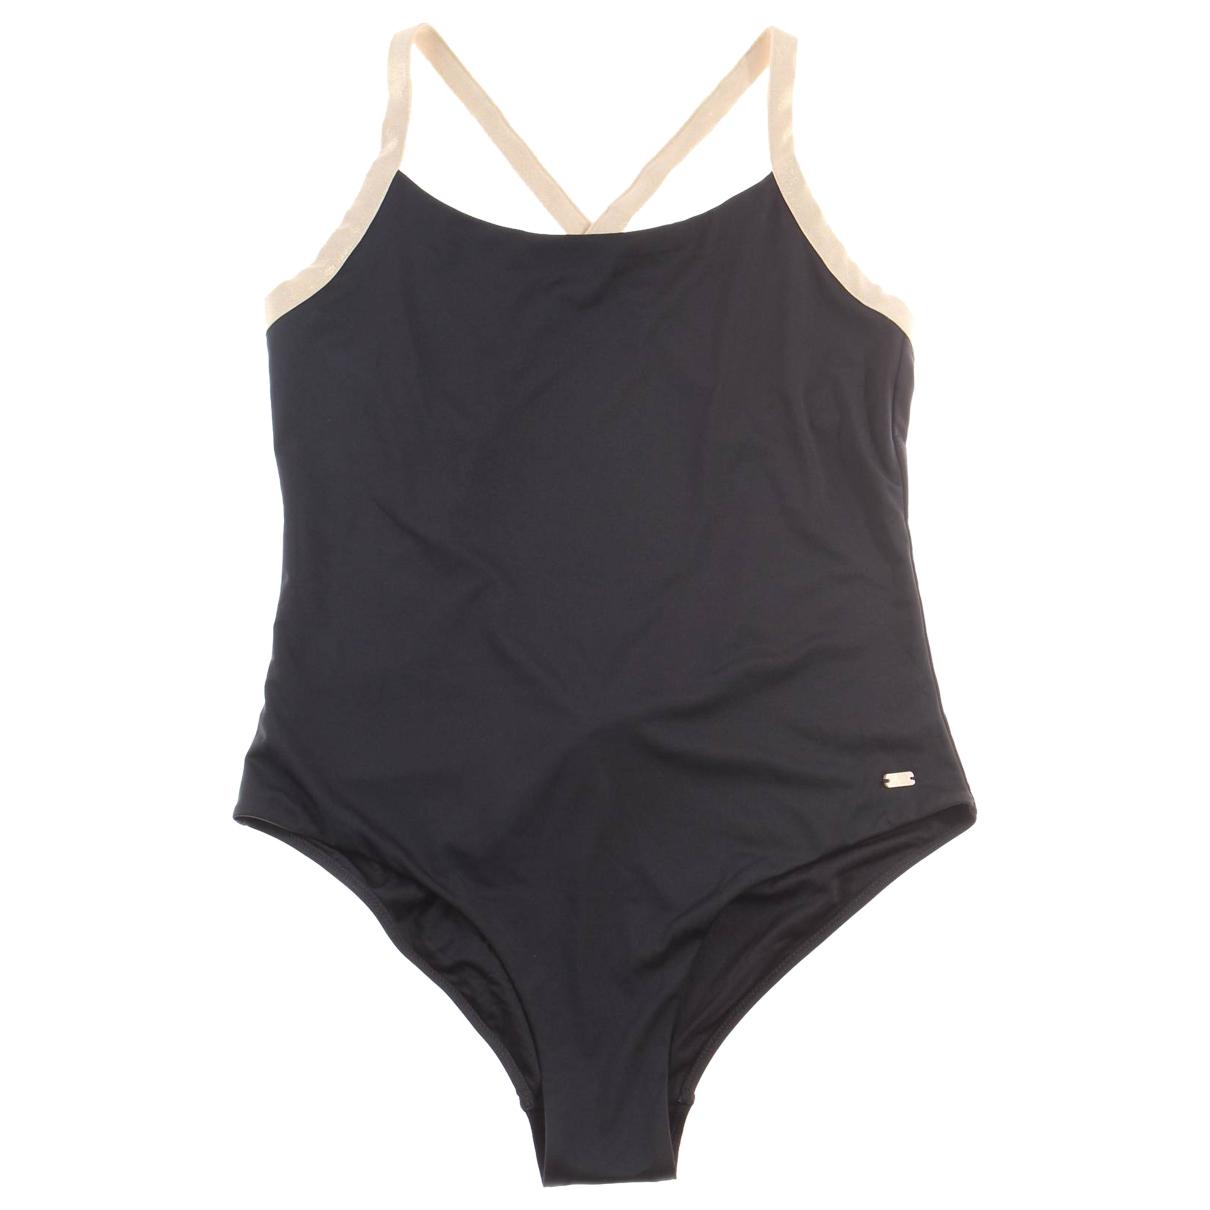 Emporio Armani \N Black Swimwear for Women L International